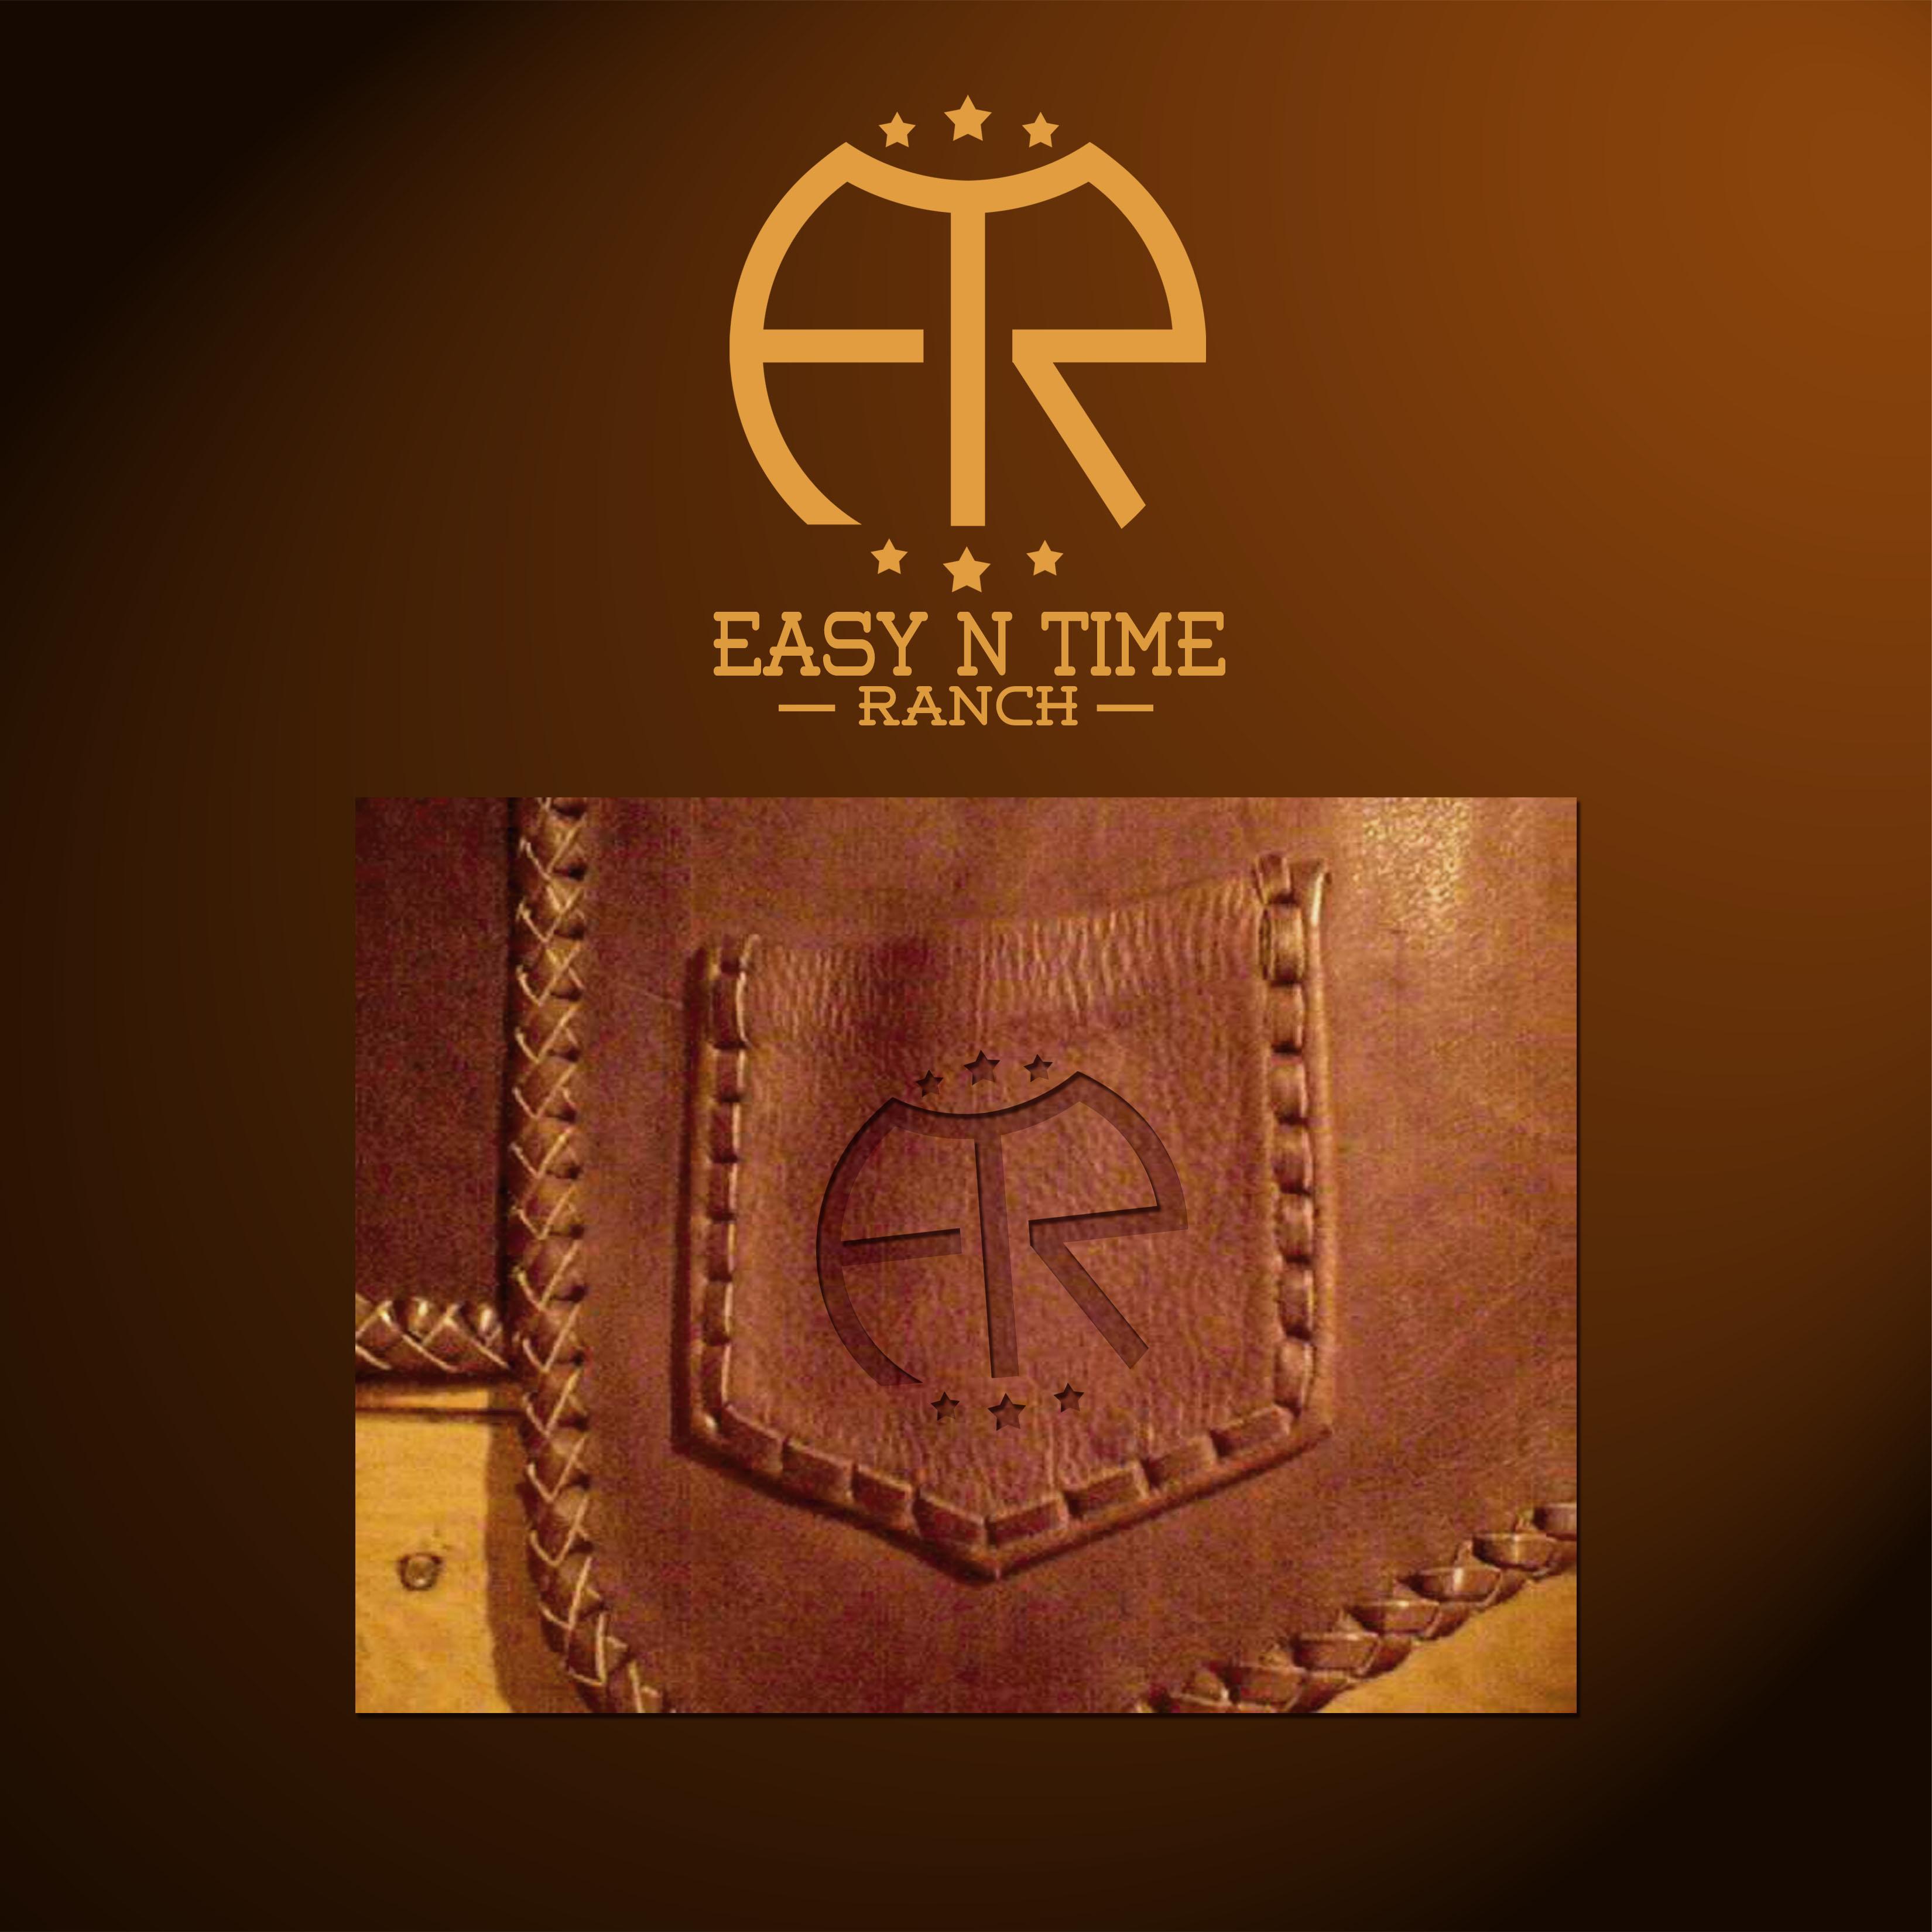 Logo Design by Allan Esclamado - Entry No. 5 in the Logo Design Contest Artistic Logo Design for Easy N Time Ranch.